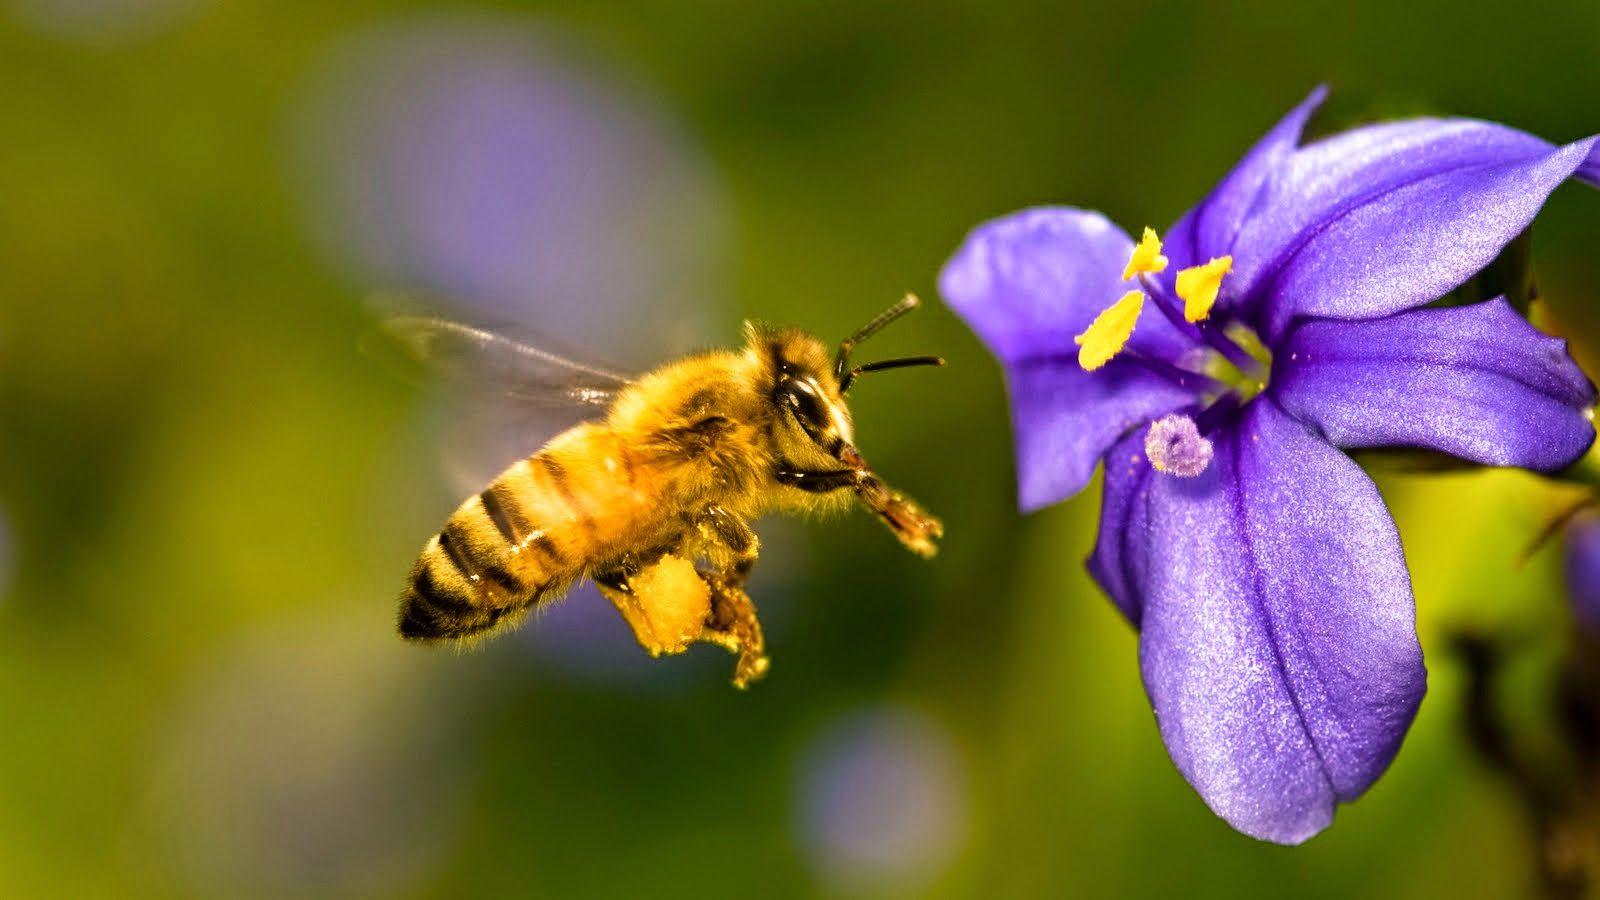 La Familia de la Apicultura - The Beekeeping of Family: Fotos de abejas - Photos of bees.